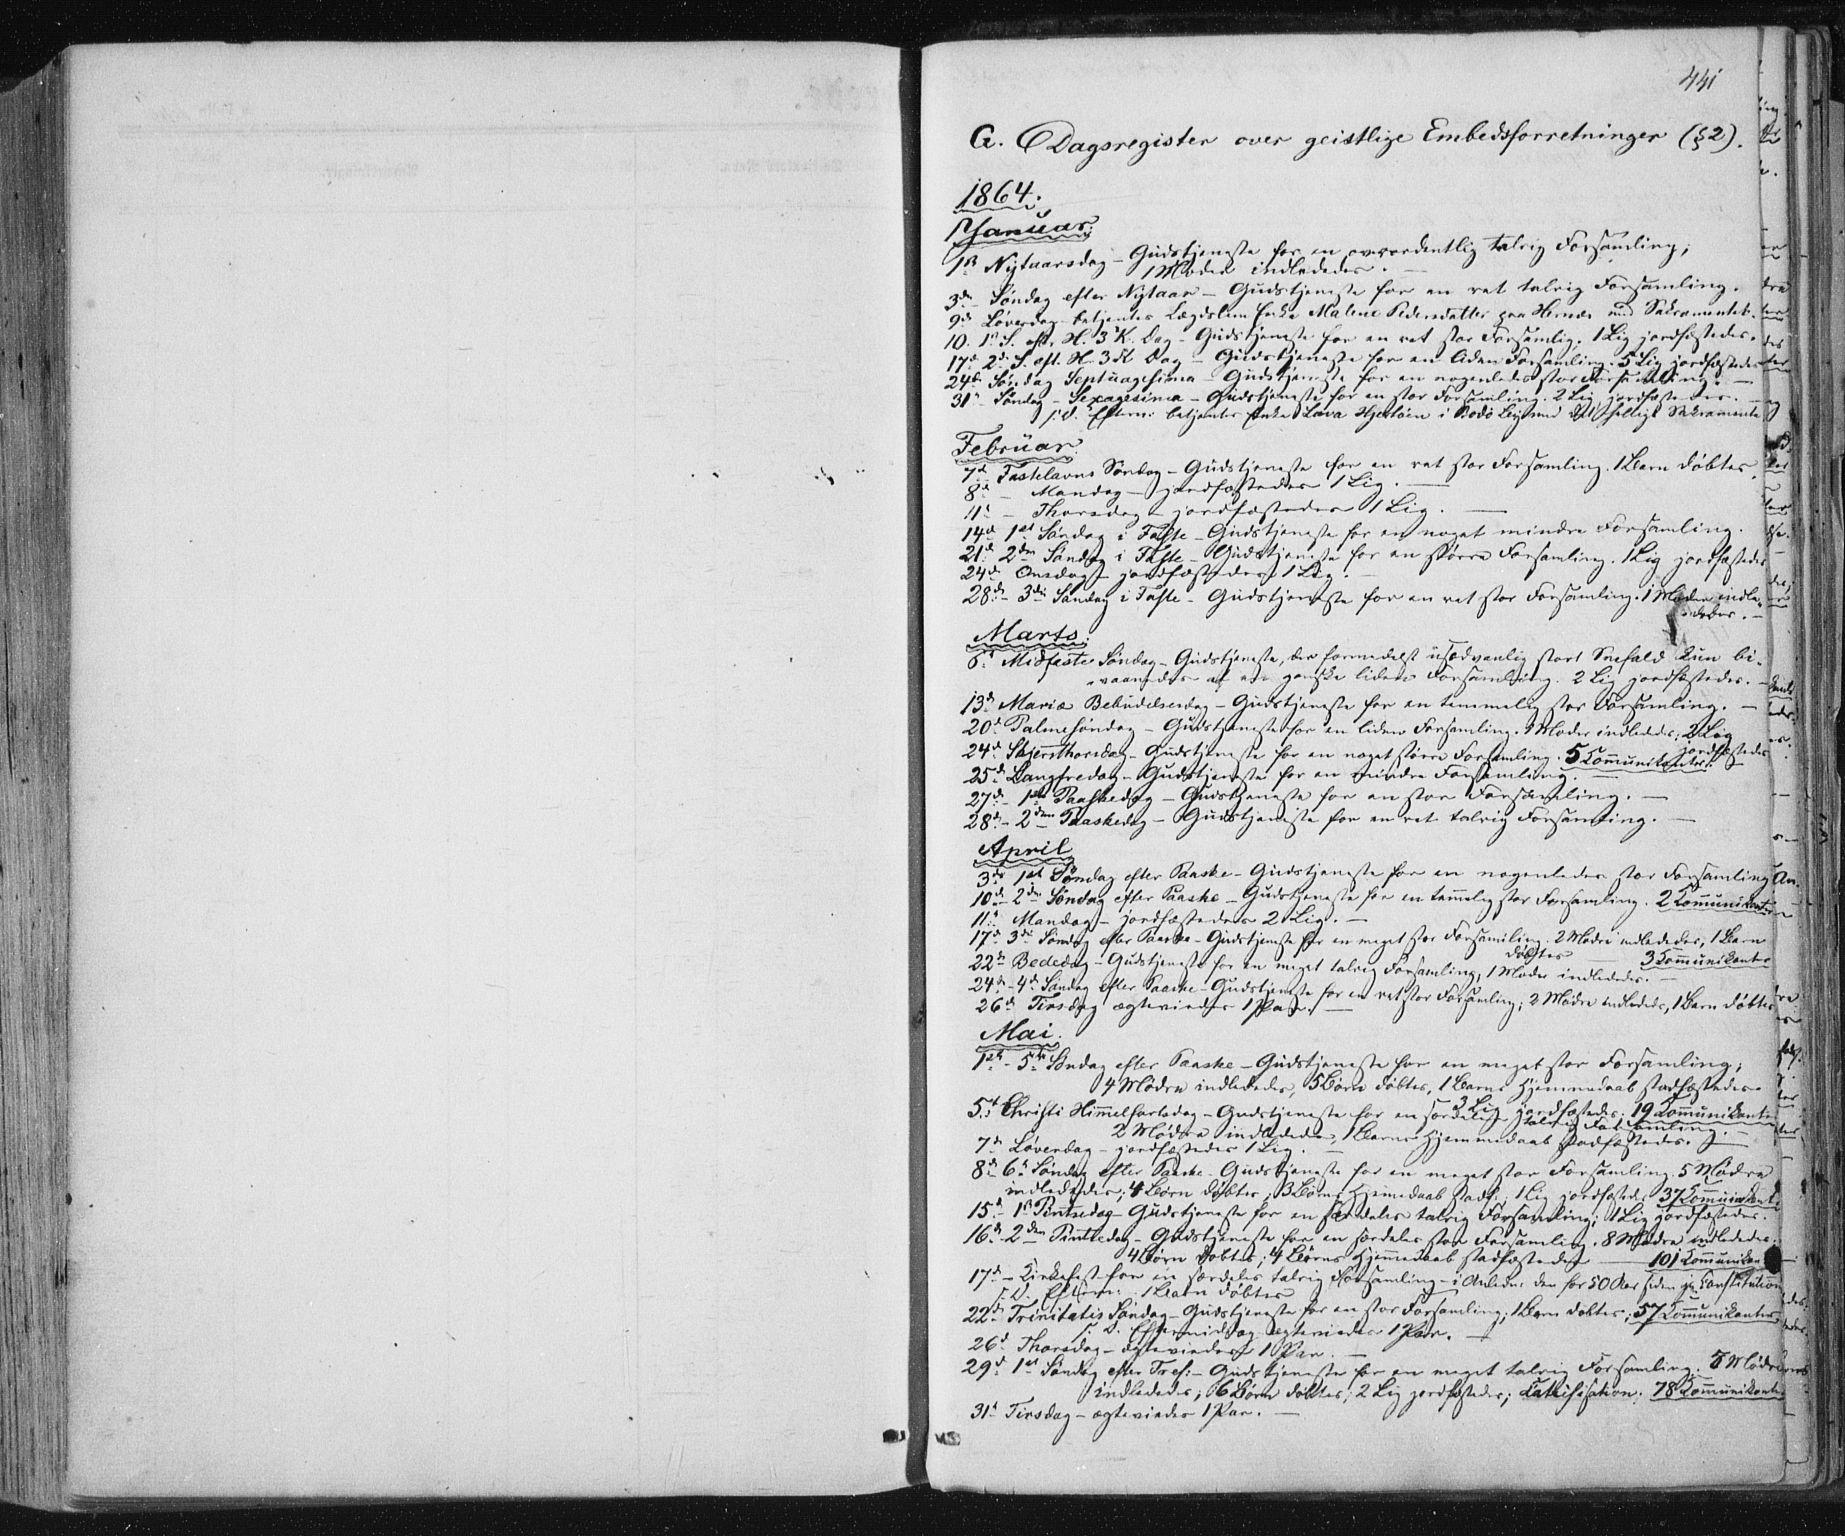 SAT, Ministerialprotokoller, klokkerbøker og fødselsregistre - Nordland, 801/L0008: Ministerialbok nr. 801A08, 1864-1875, s. 441